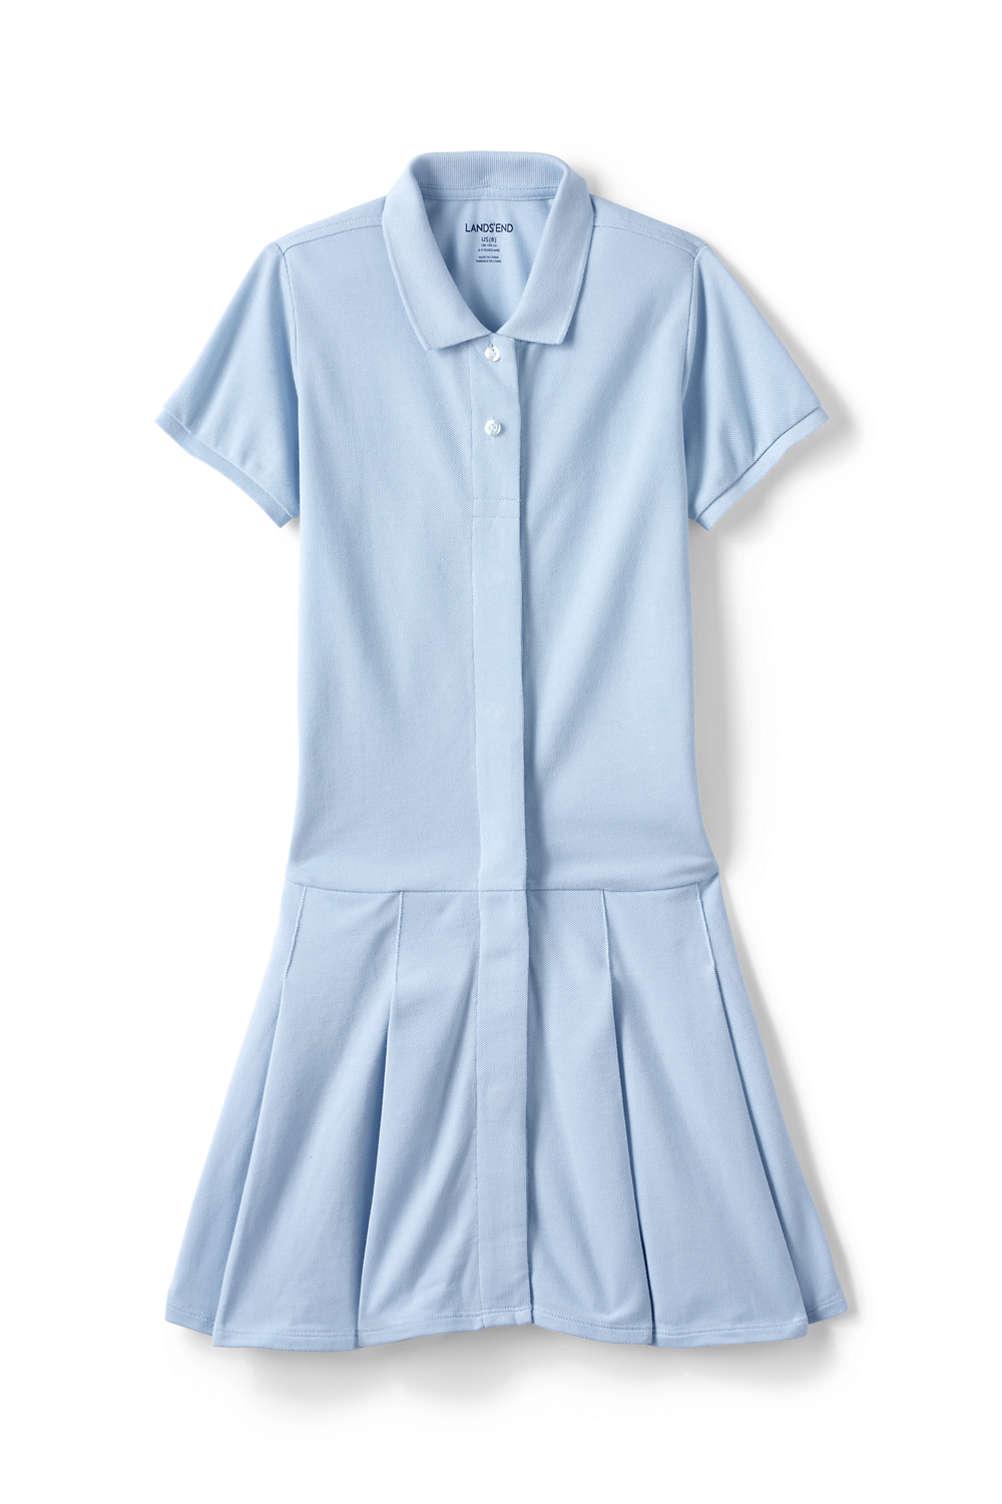 e2dee846f35c School Uniform Girls Adaptive Mesh Polo Dress from Lands' End